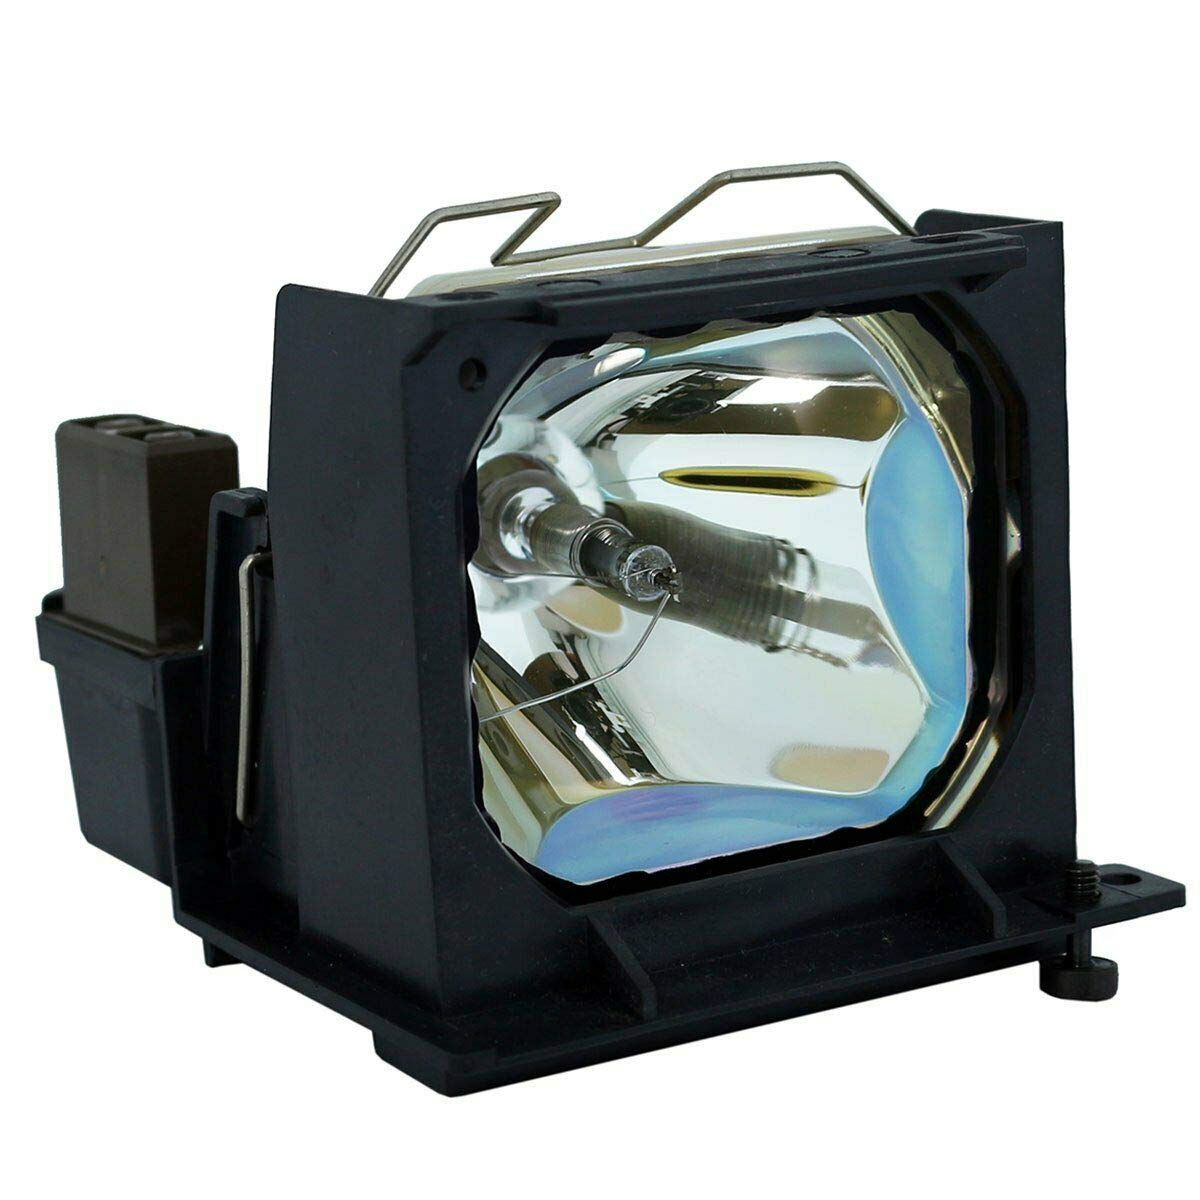 CTLAMP MT40LP / 50018704 交換用ランプ ハウジング付き NEC MT1040 / MT1040E / MT1045 / MT840 / MT840E / MT840G / MT1040G / MT1045Gに対応   B07NVG2SMY